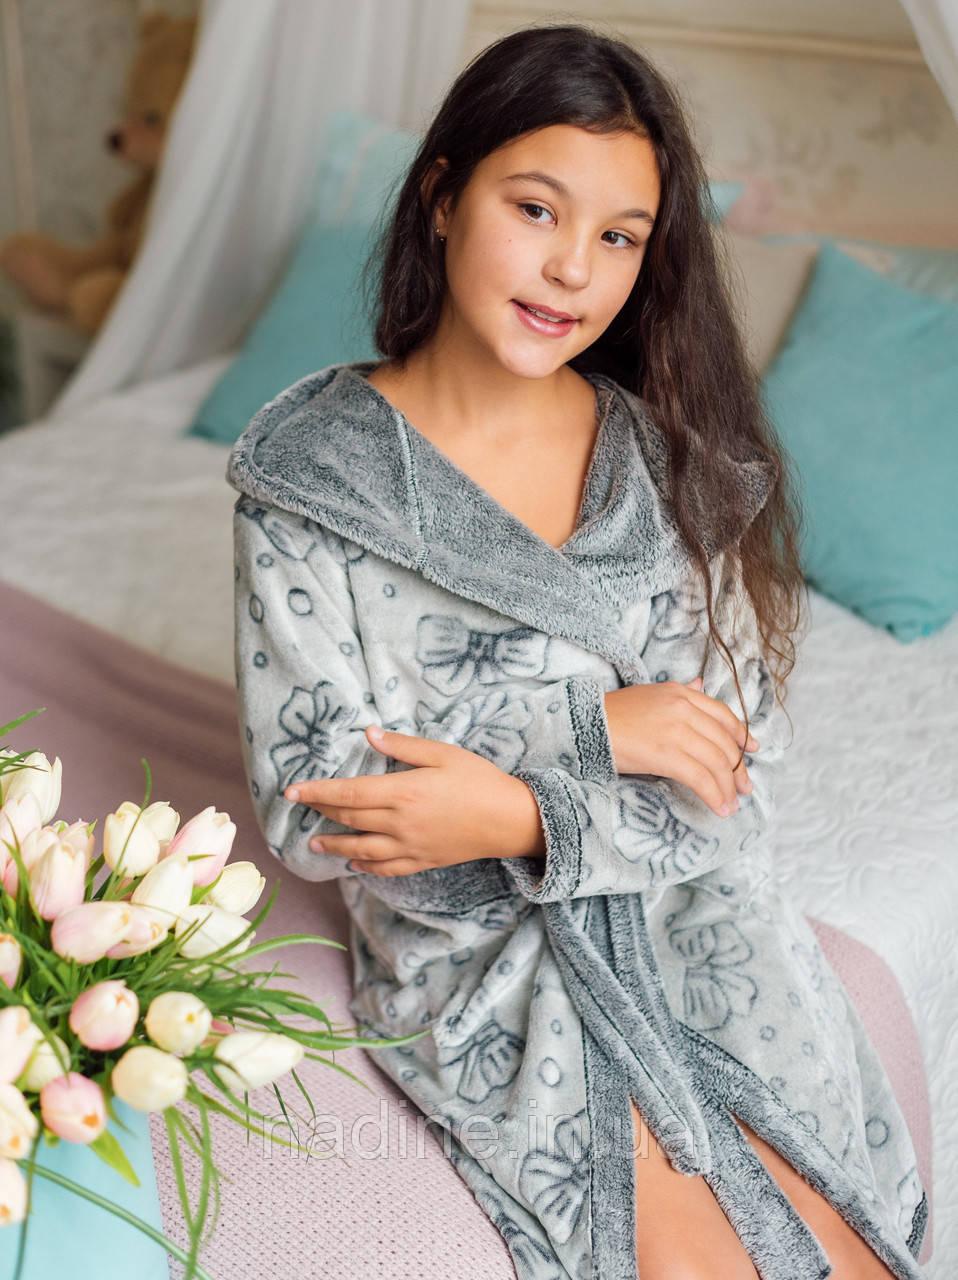 Стильный Халатик Silver Eirena Nadine (40-529) рост 140 серый